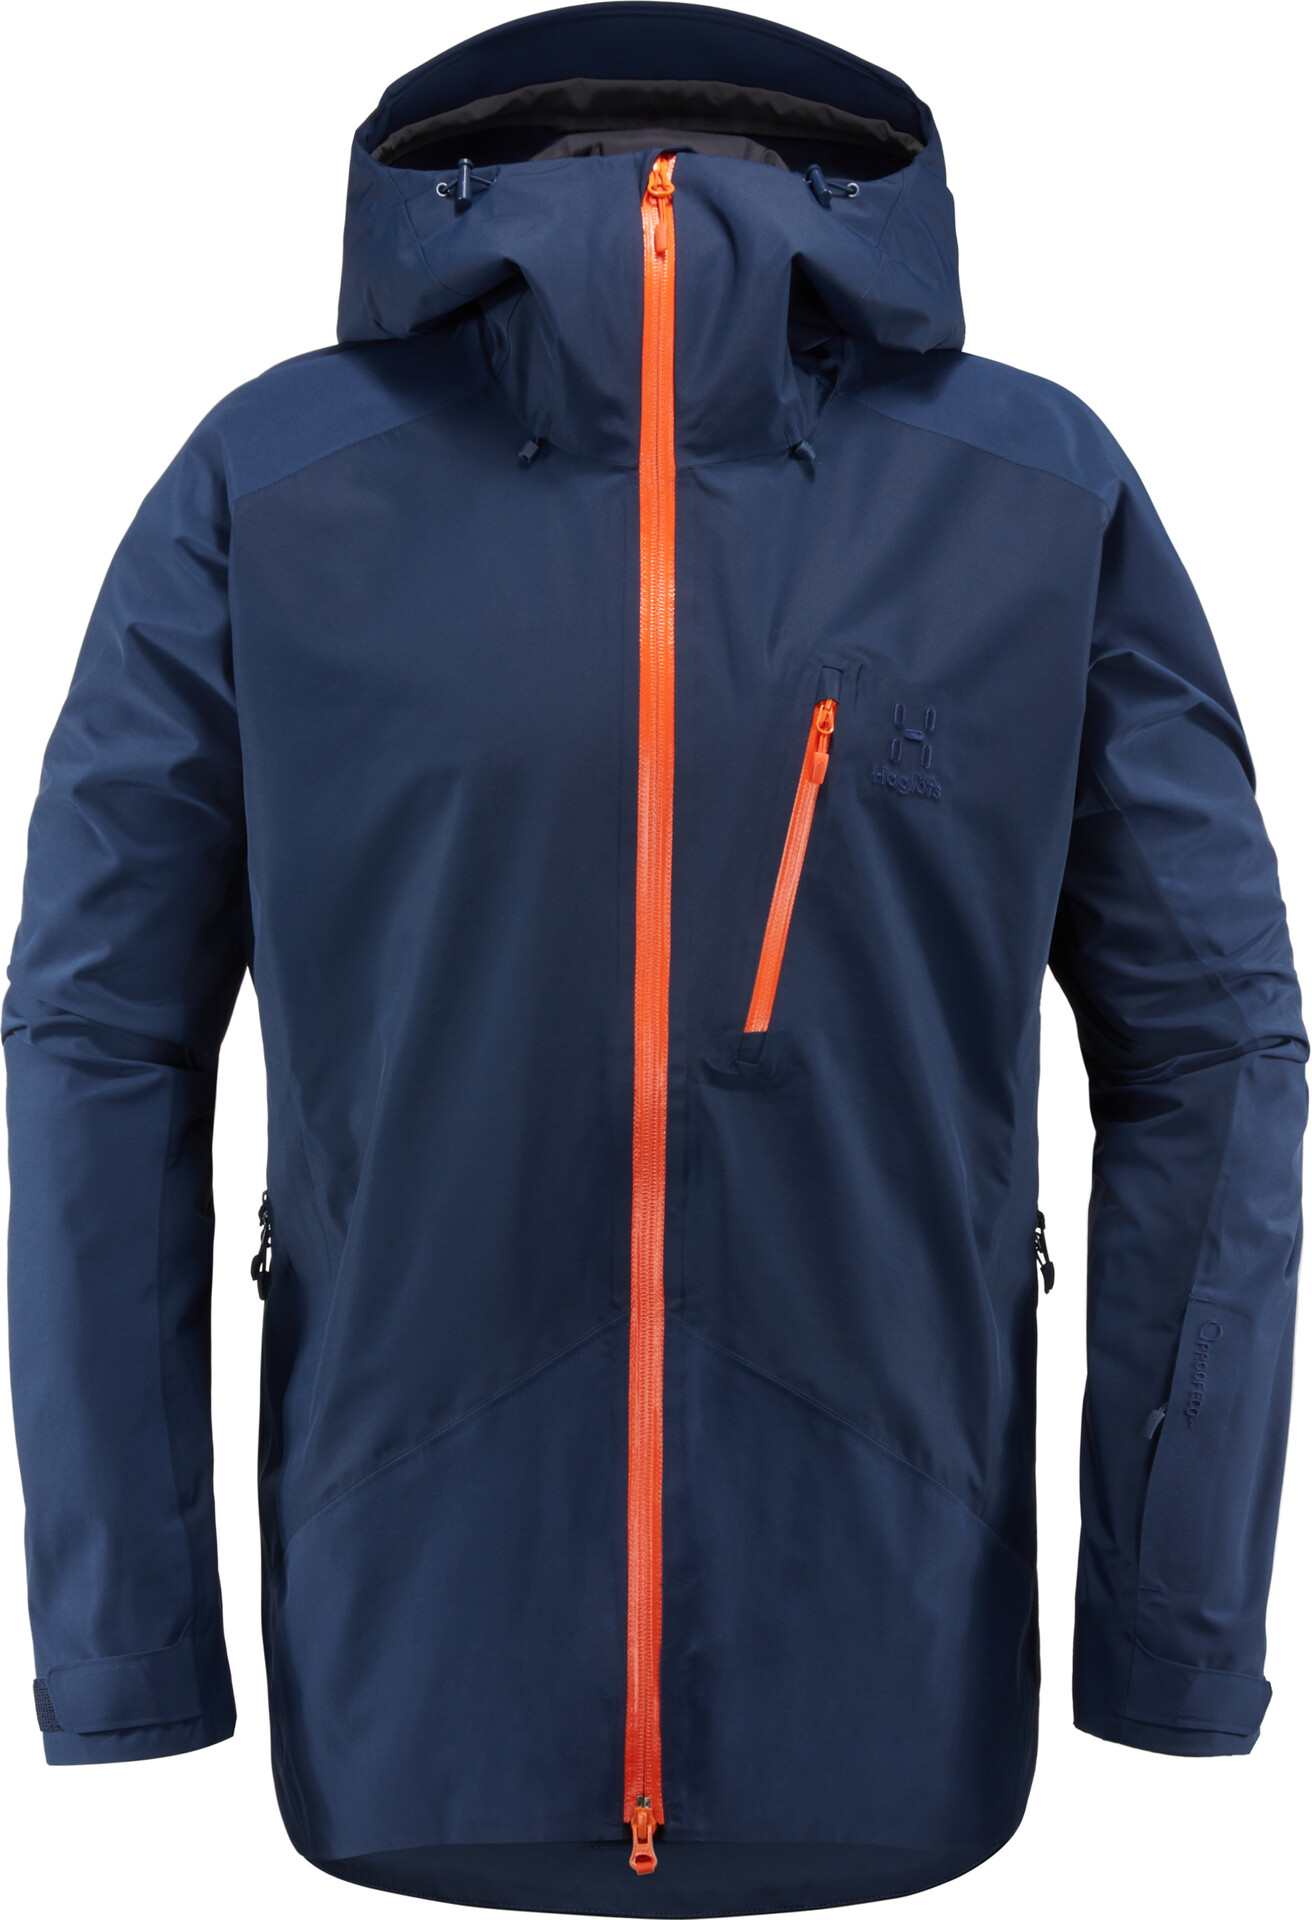 Niva Jacket Herren Tarn Blue Haglöfs YWDEHI29